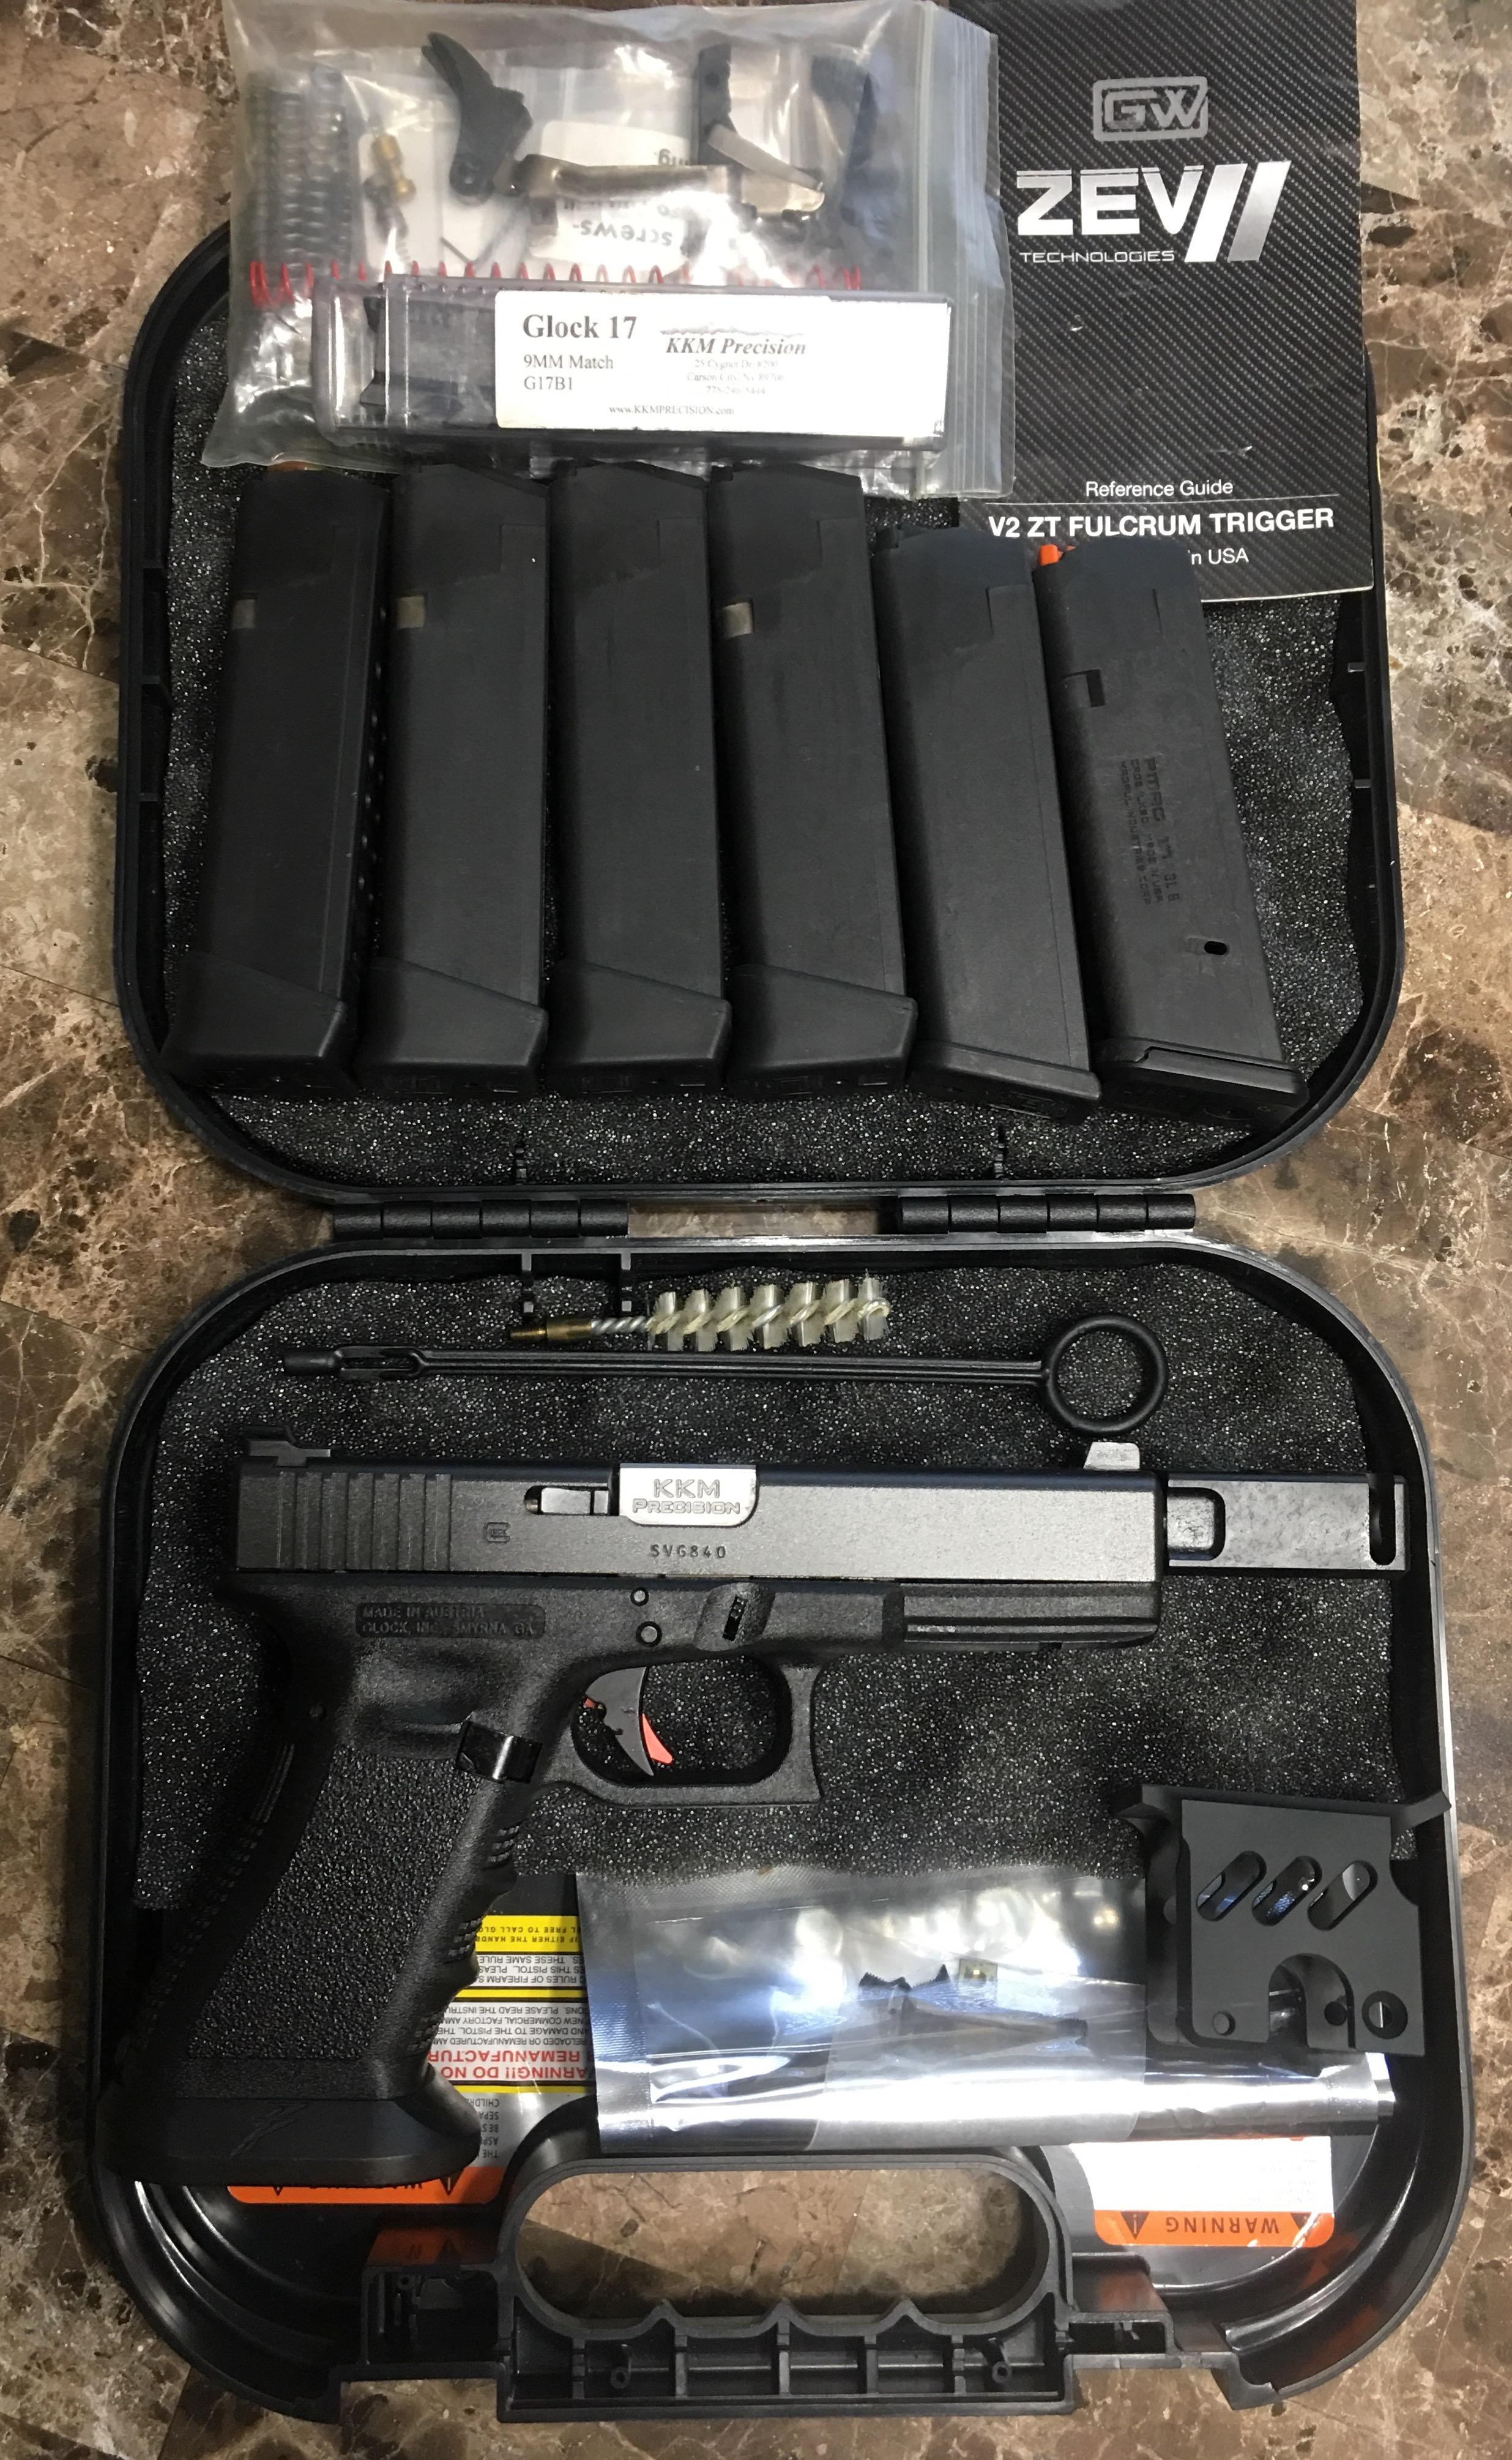 Glock 17, CZ 75 SP-01, Kimber Warrior 1911 | Mississippi Gun Owners